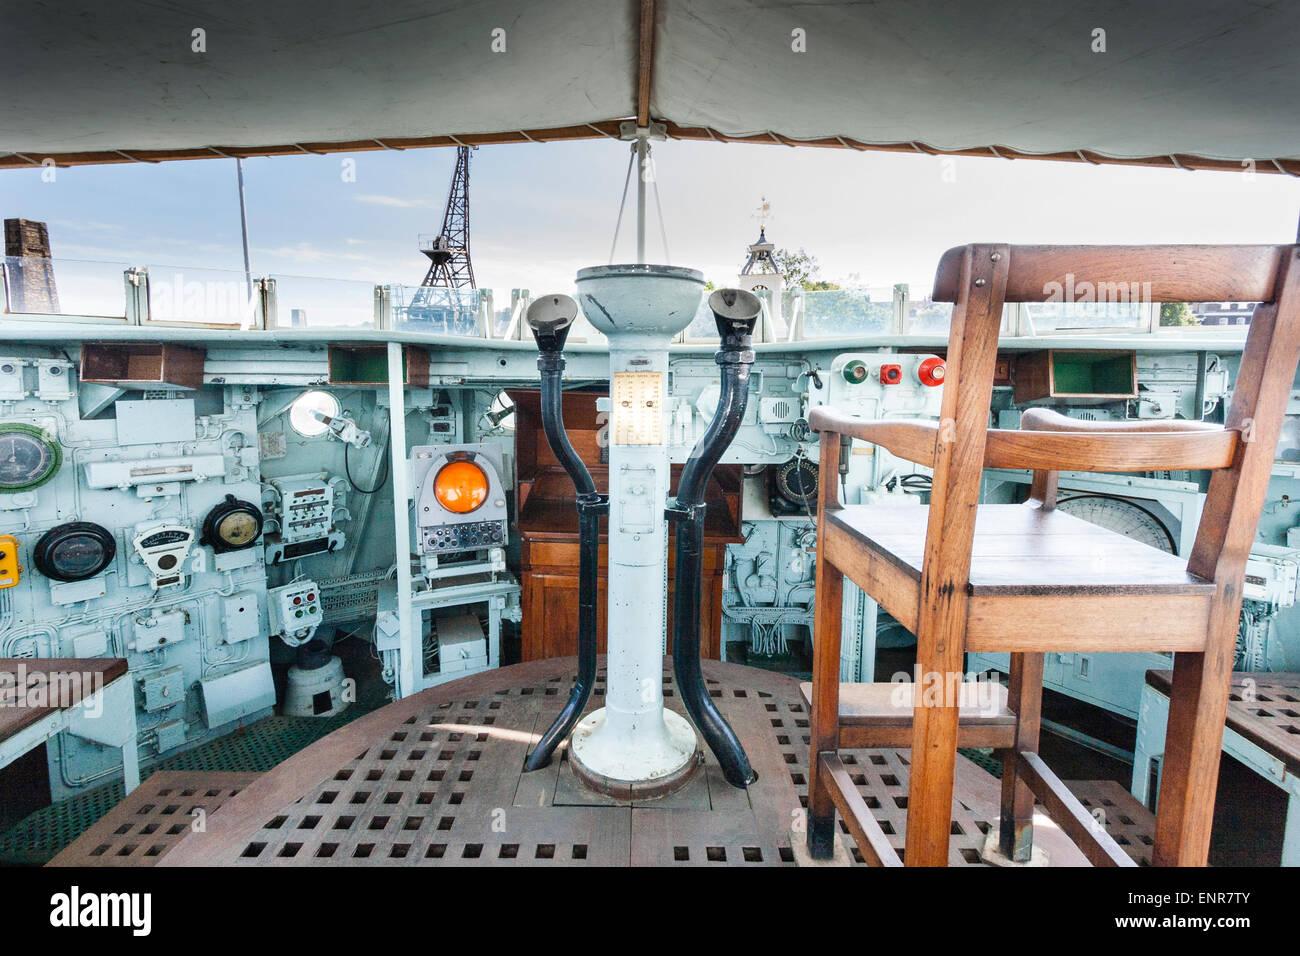 England, Chatham Dockyard. English warship, C class destroyer R73 HMS Cavalier, bridge and Captain's chair - Stock Image